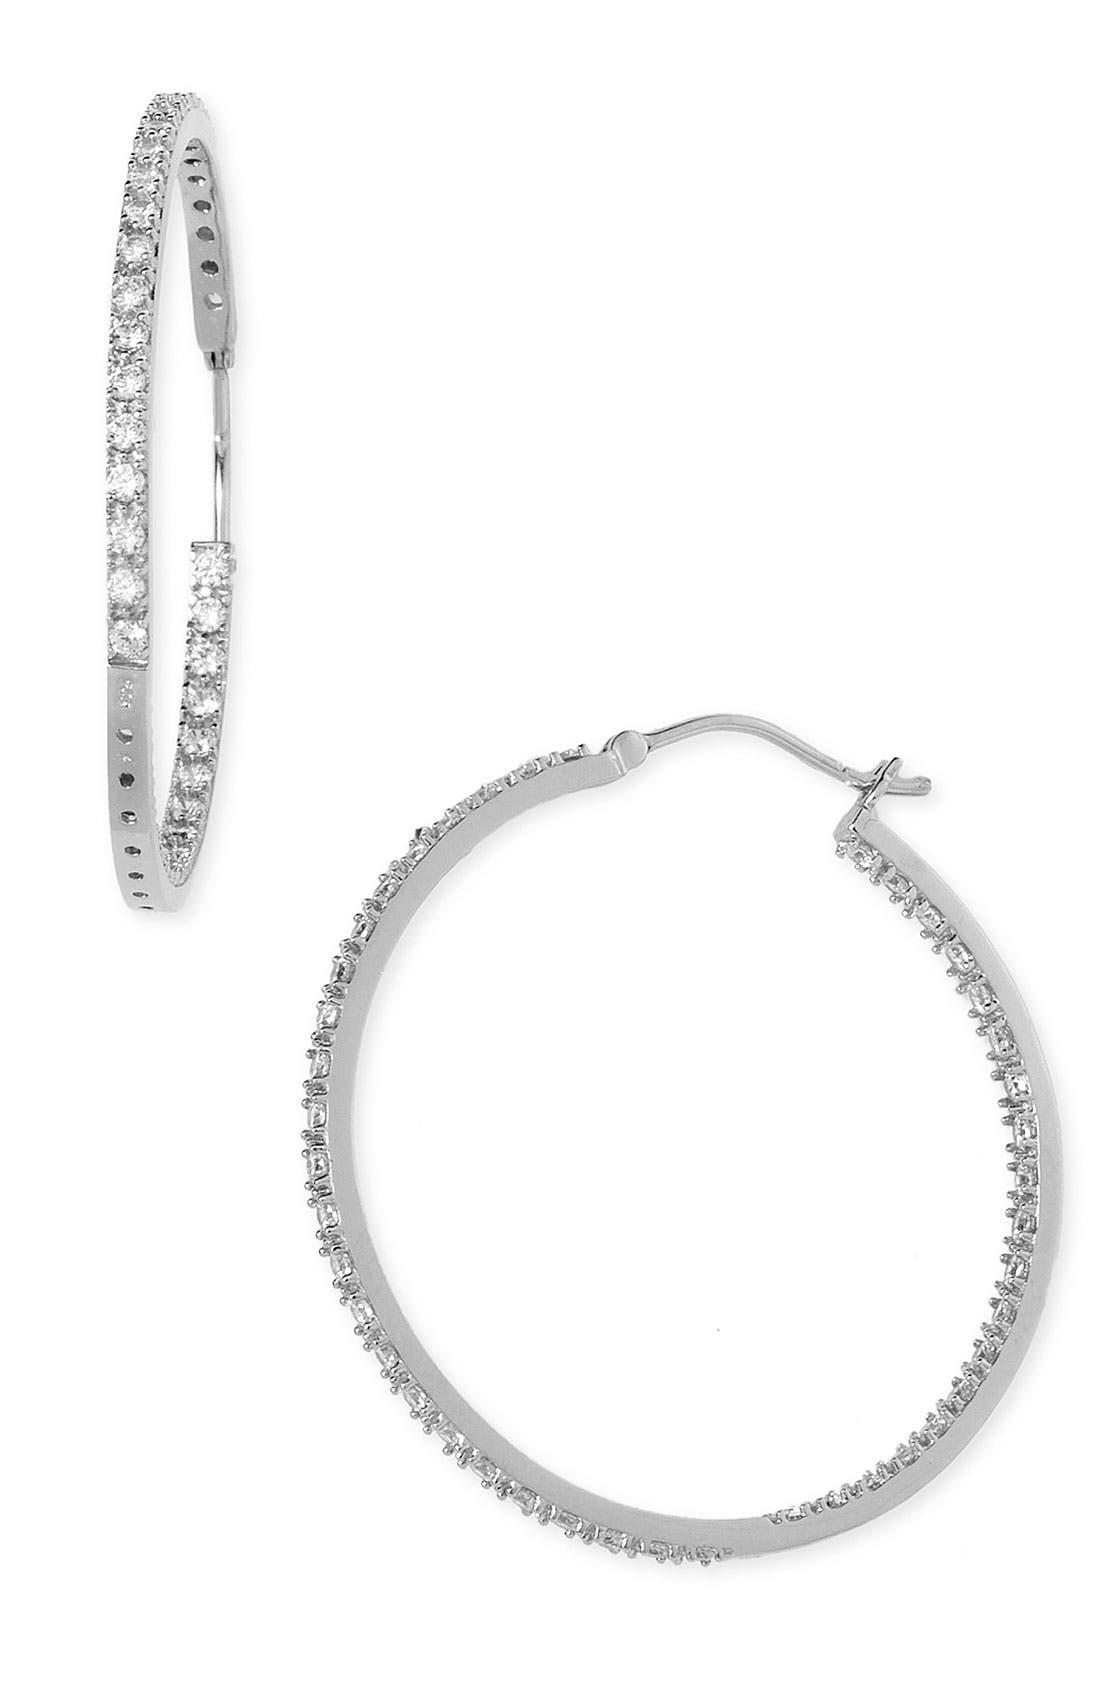 Main Image - Nordstrom 'Inside Out' Cubic Zirconia Hoop Earrings